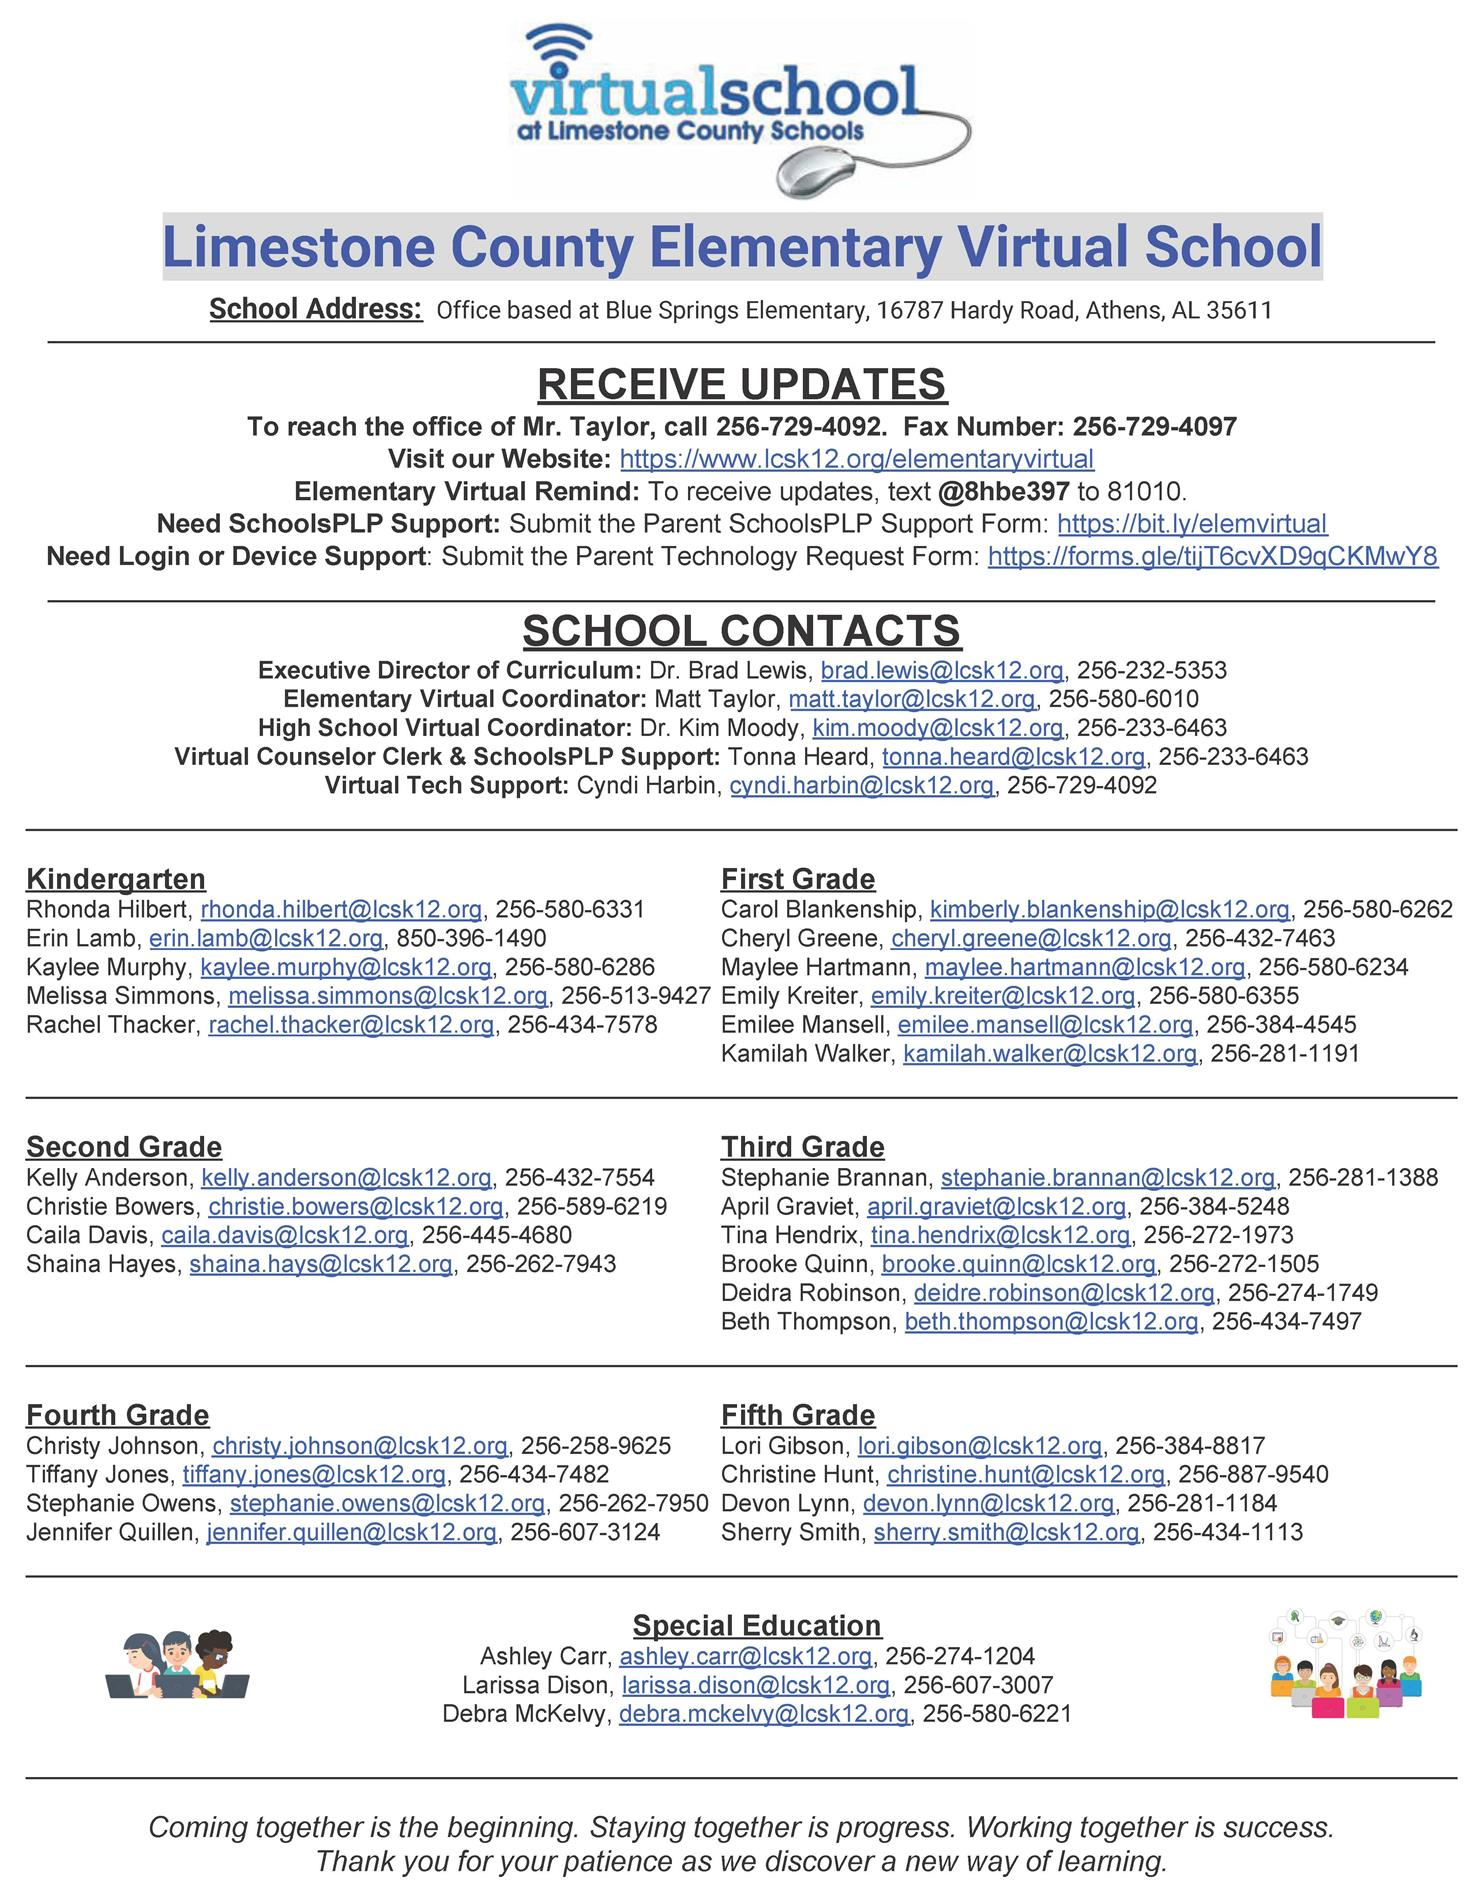 LCS Elementary Virtual Information Sheet